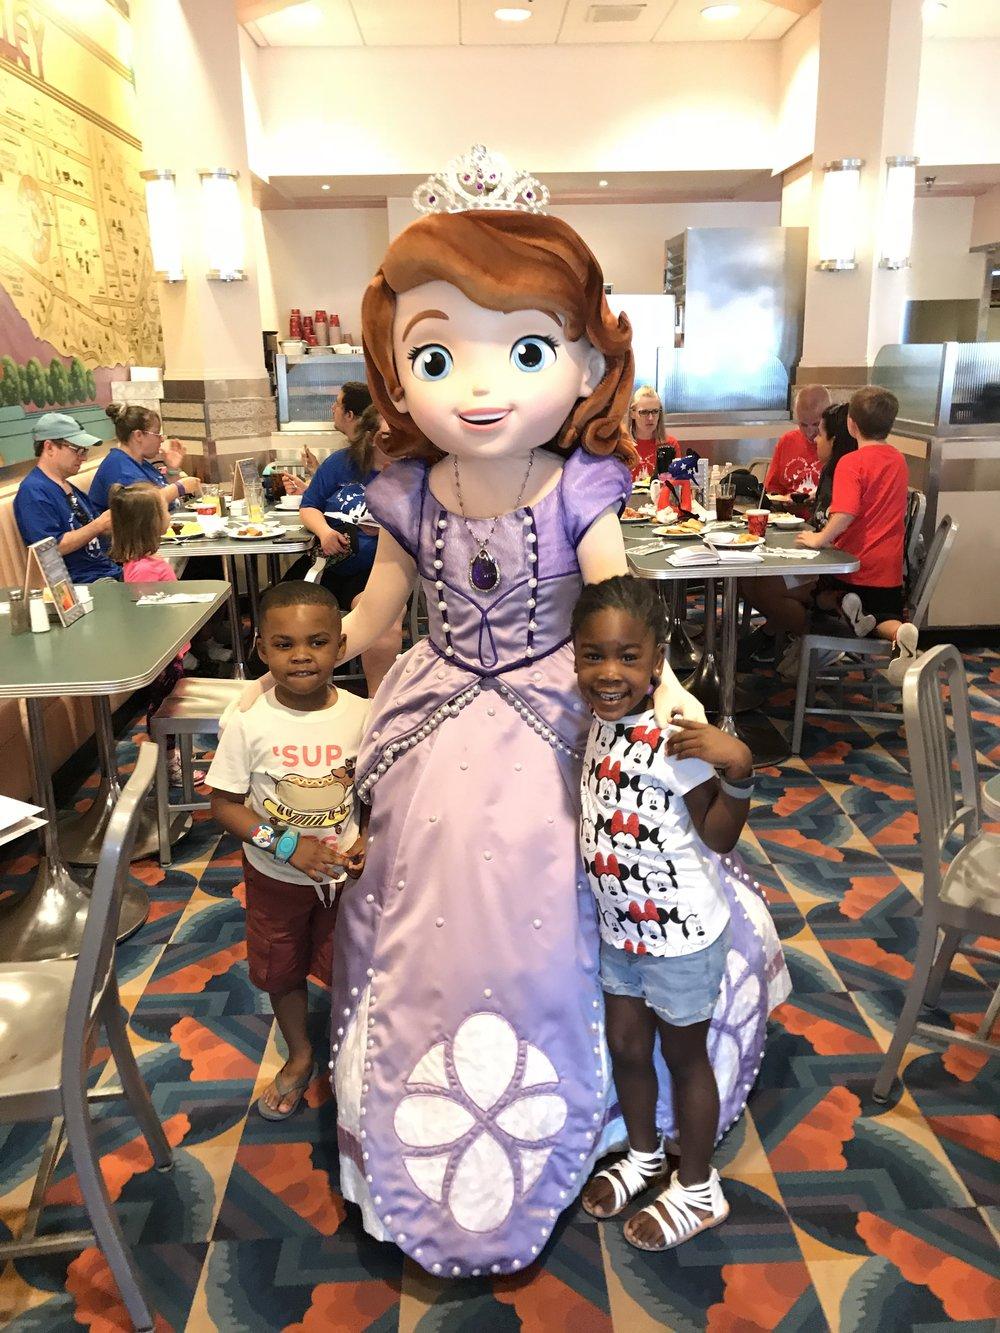 Disney-with-toddlers-magic-kingdom-3.jpg